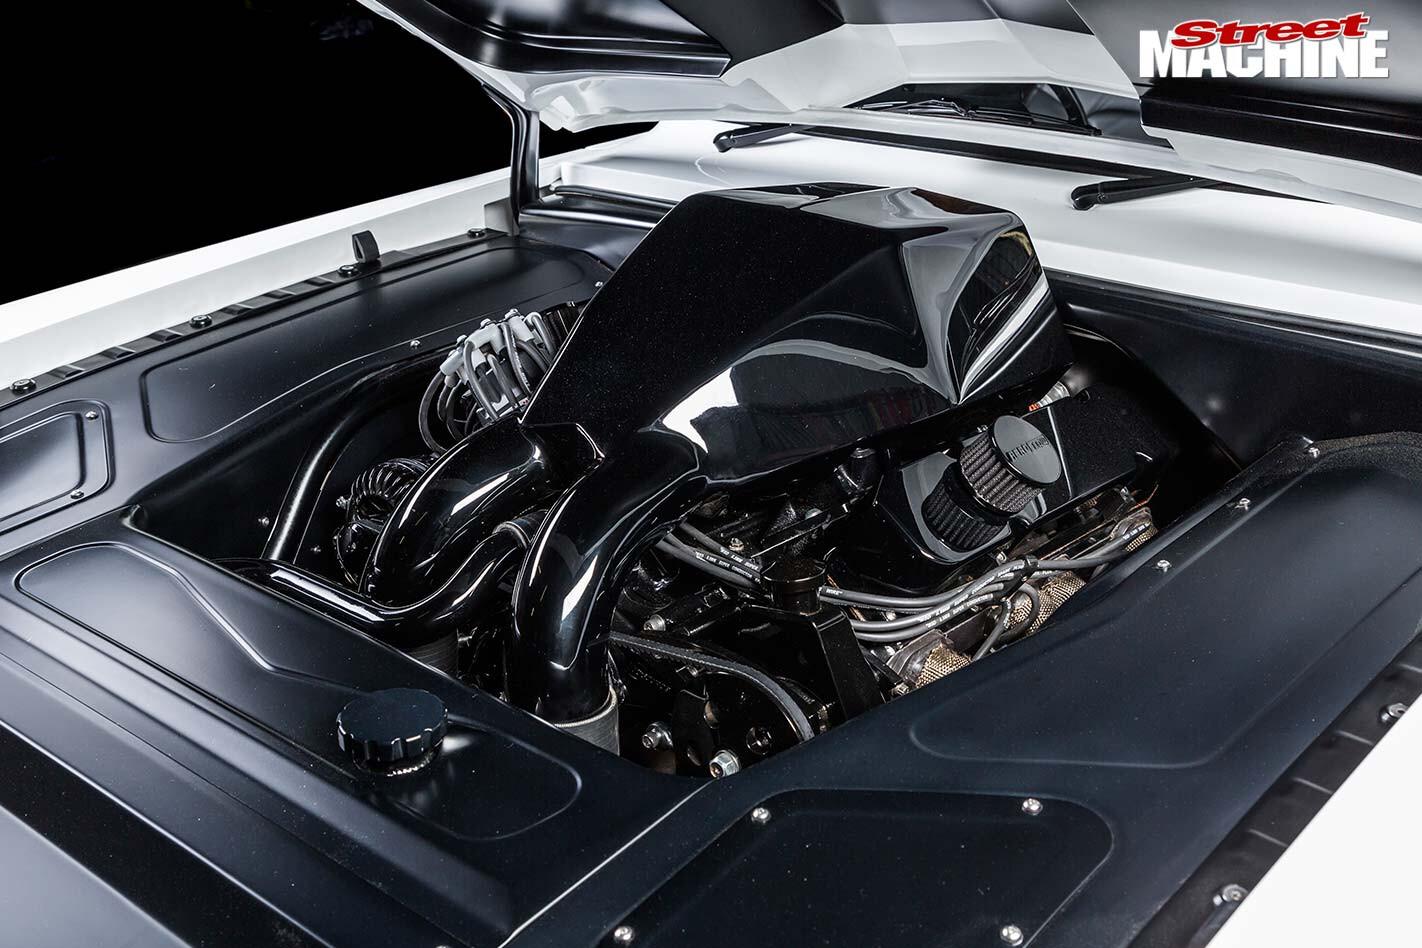 Chrysler VG Valiant engine bay